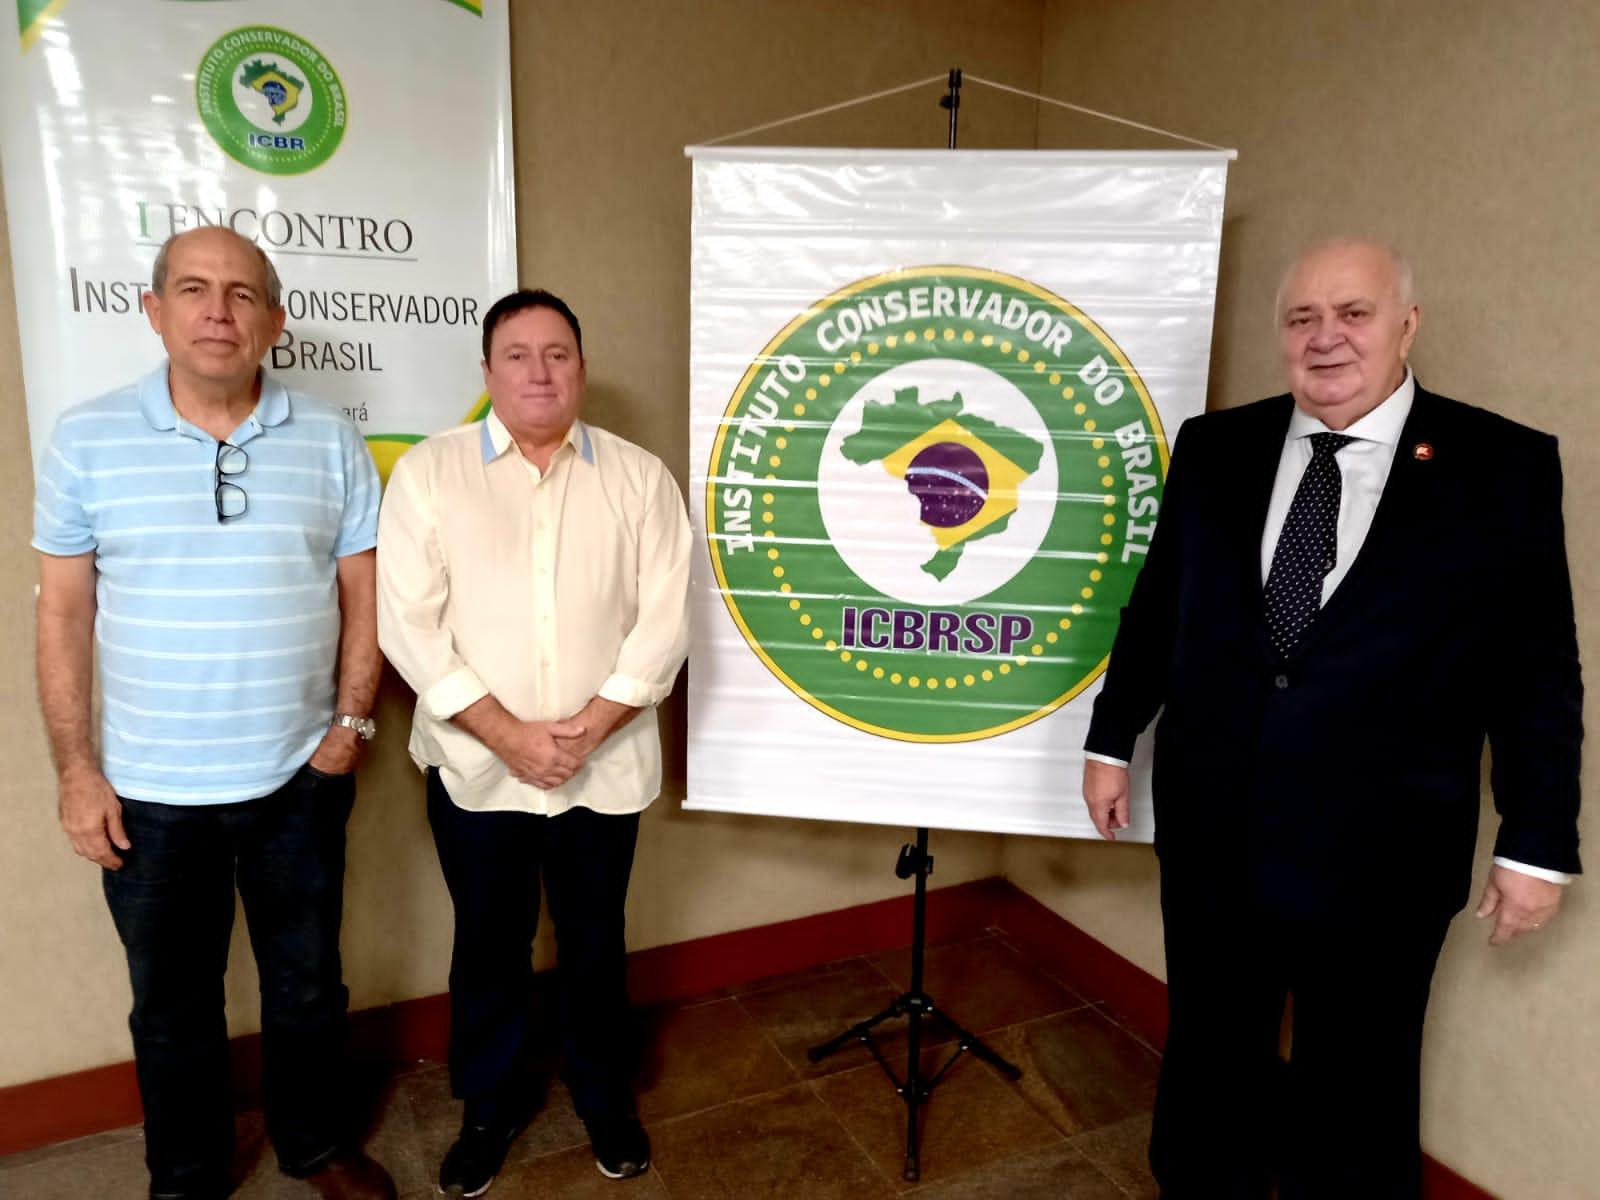 instituto conservador brasil